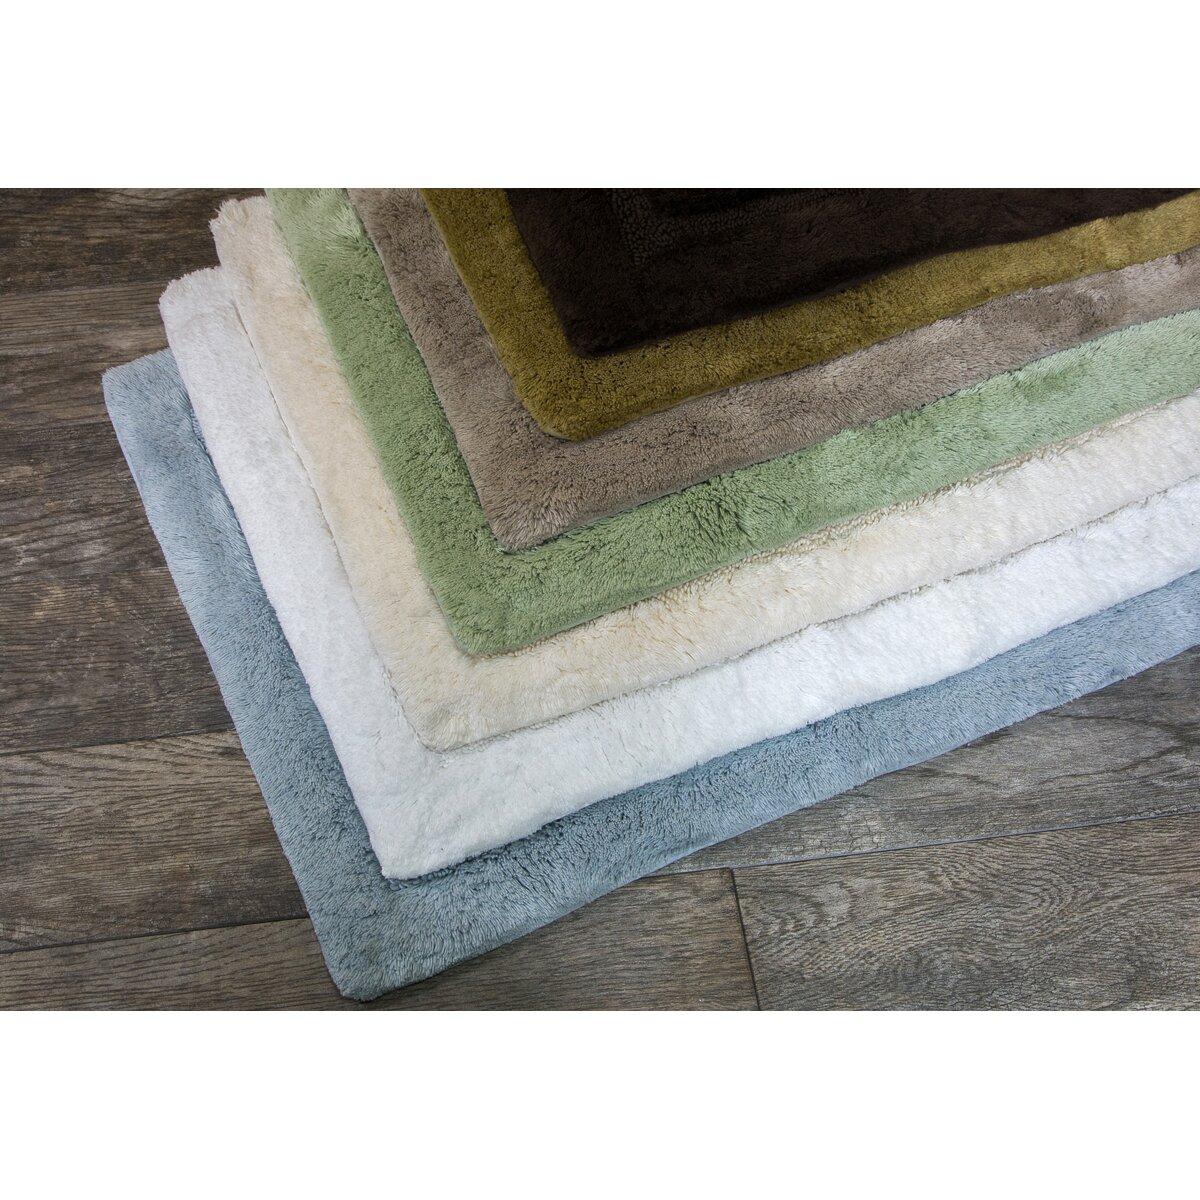 grund america namo organic cotton bath rug & reviews | wayfair